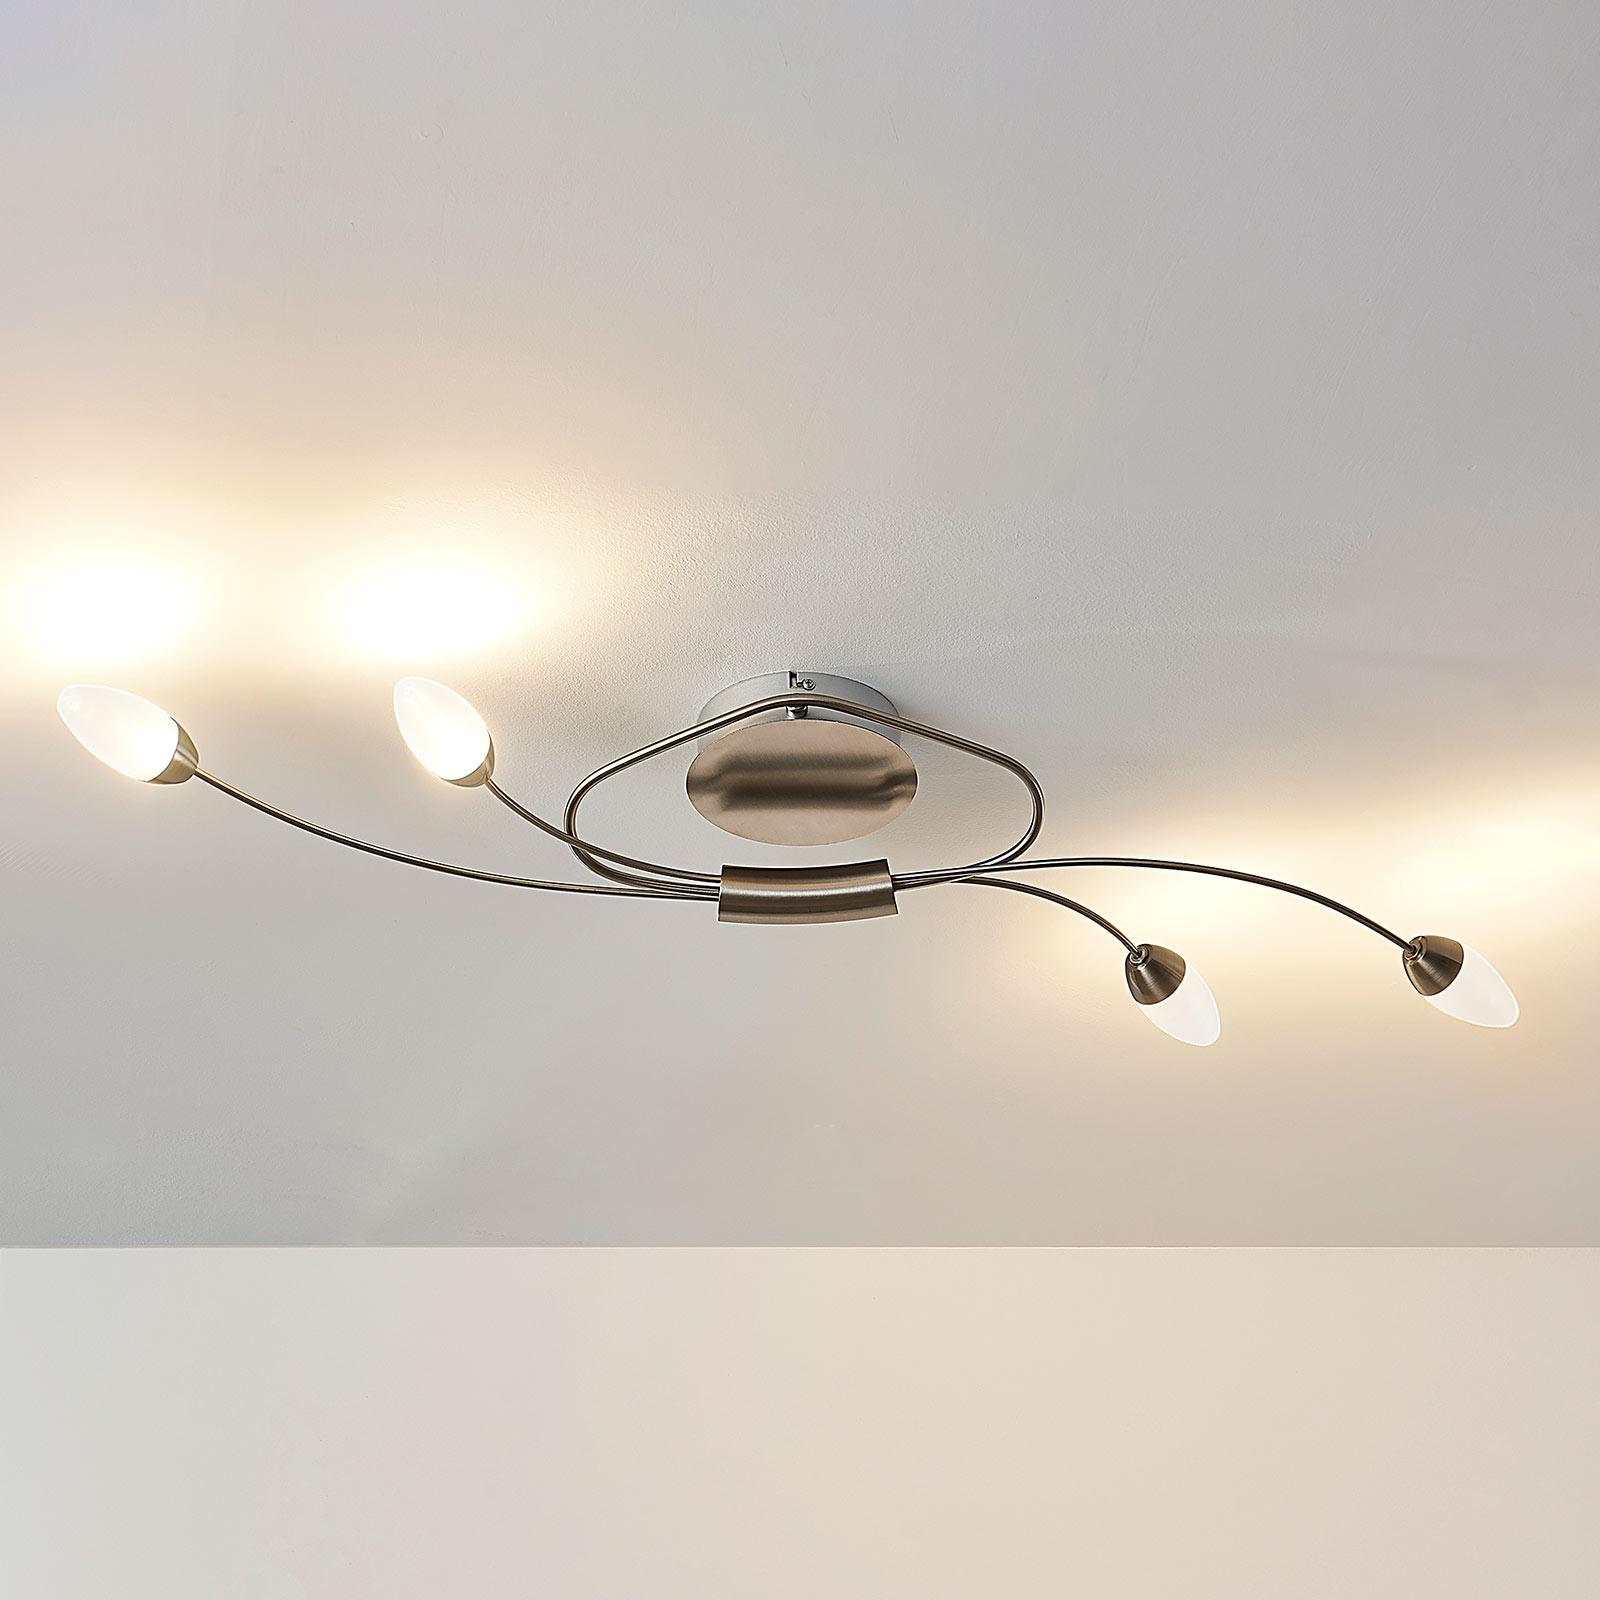 4-punktowa lampa sufitowa LED Deyan, ściemniana